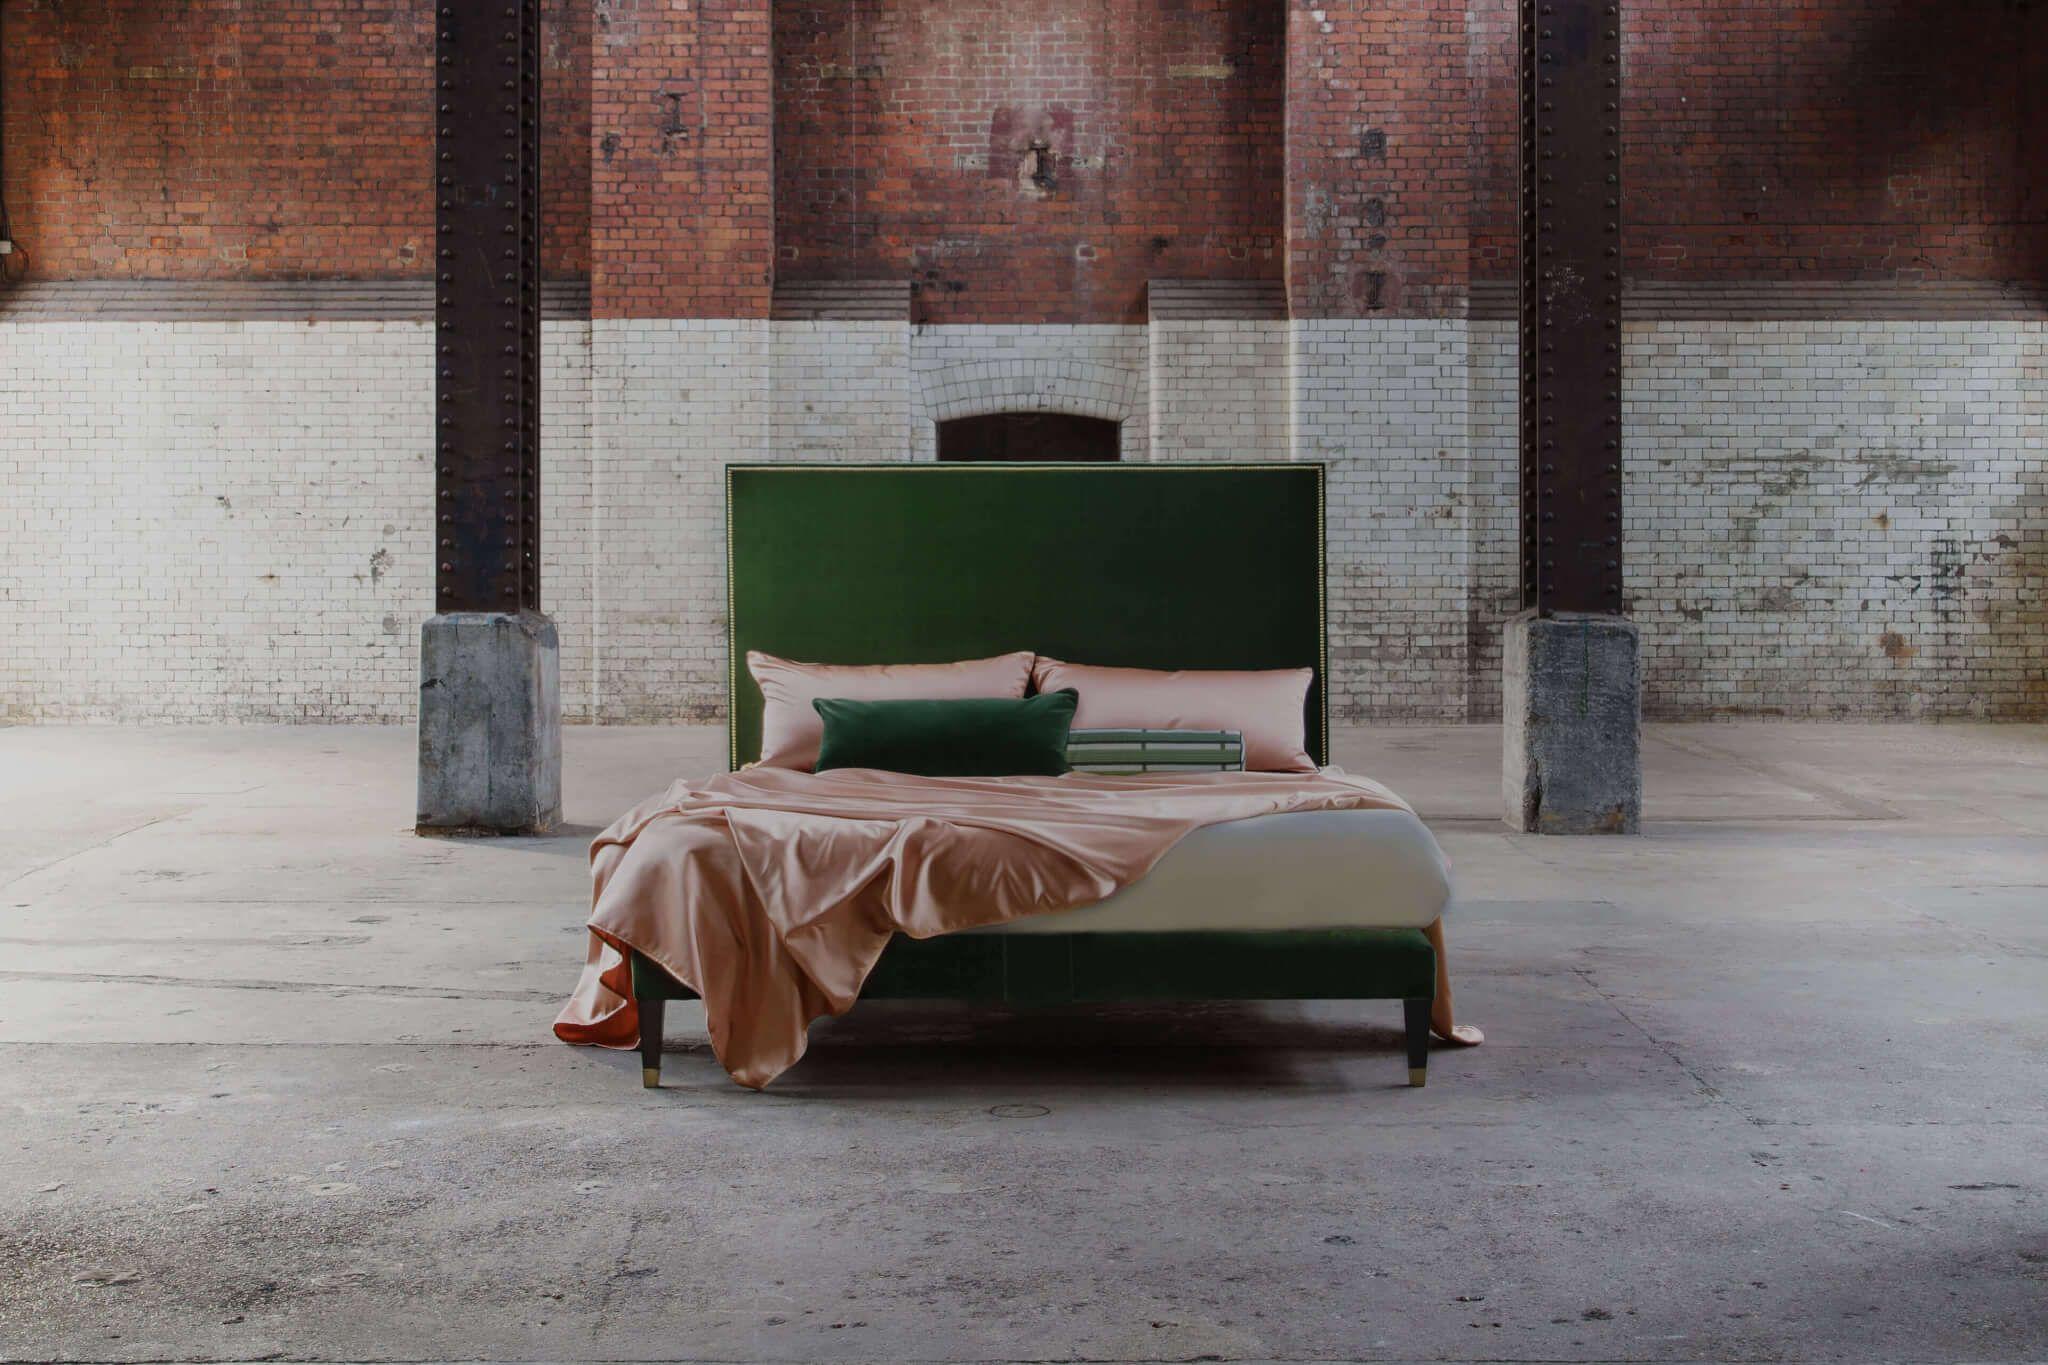 Savoir S Nº4 Bed In 2020 Luxury Bedding Bed Design Luxury